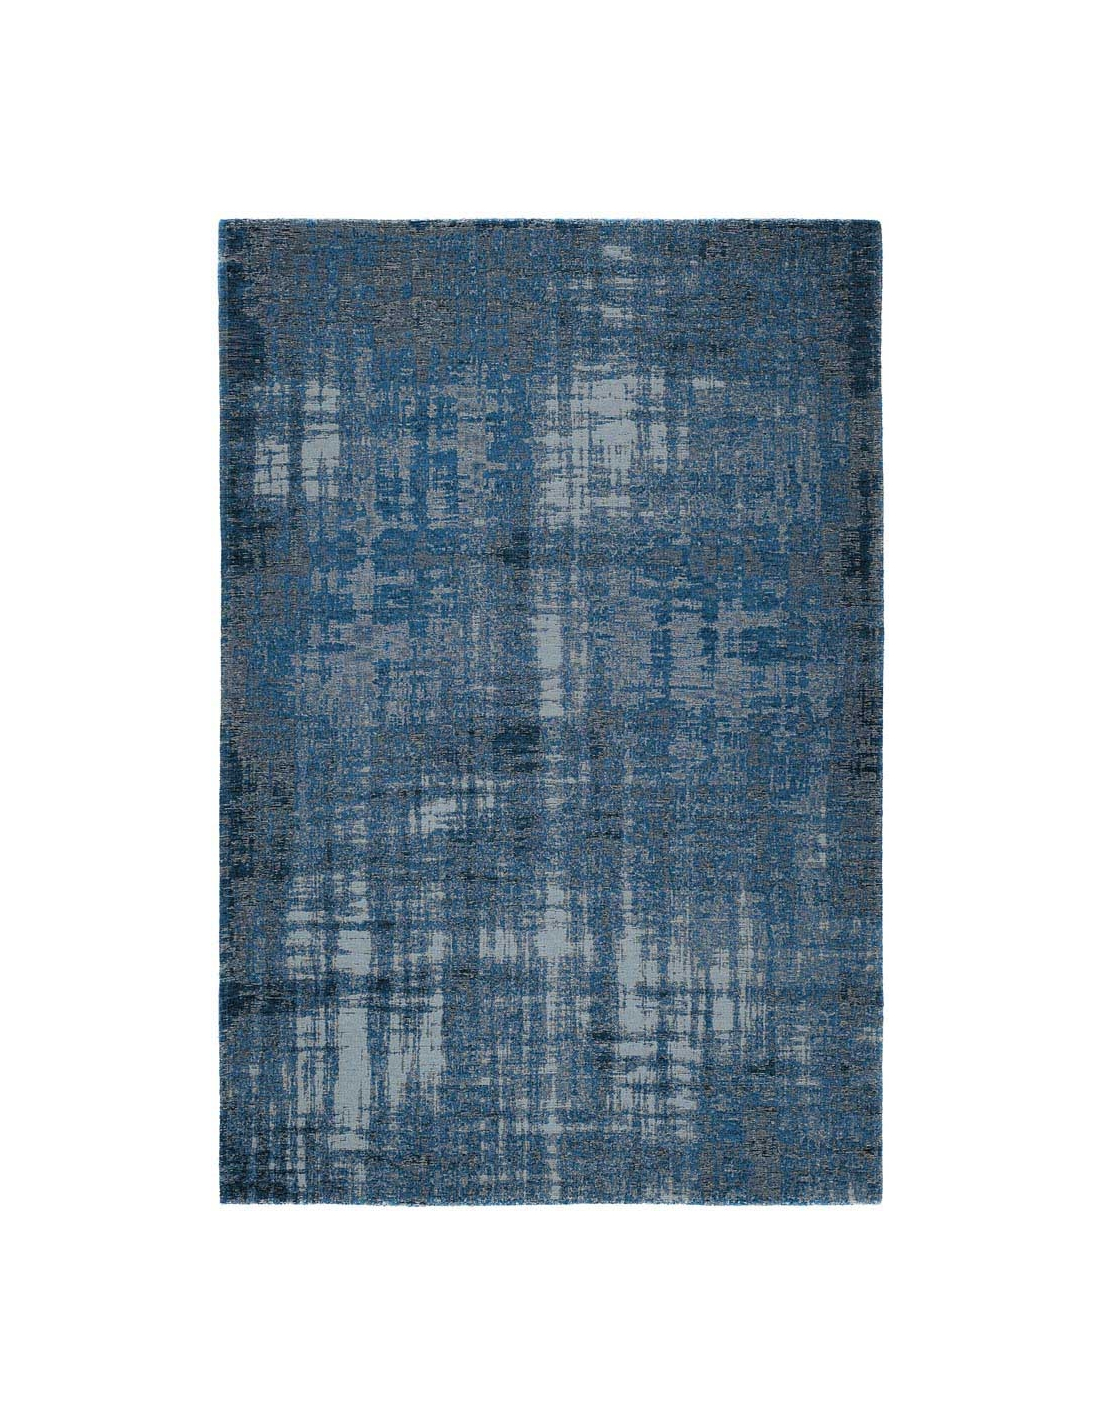 Comprar alfombra antik chenille de poliester acr lico algod n - Alfombras de poliester ...